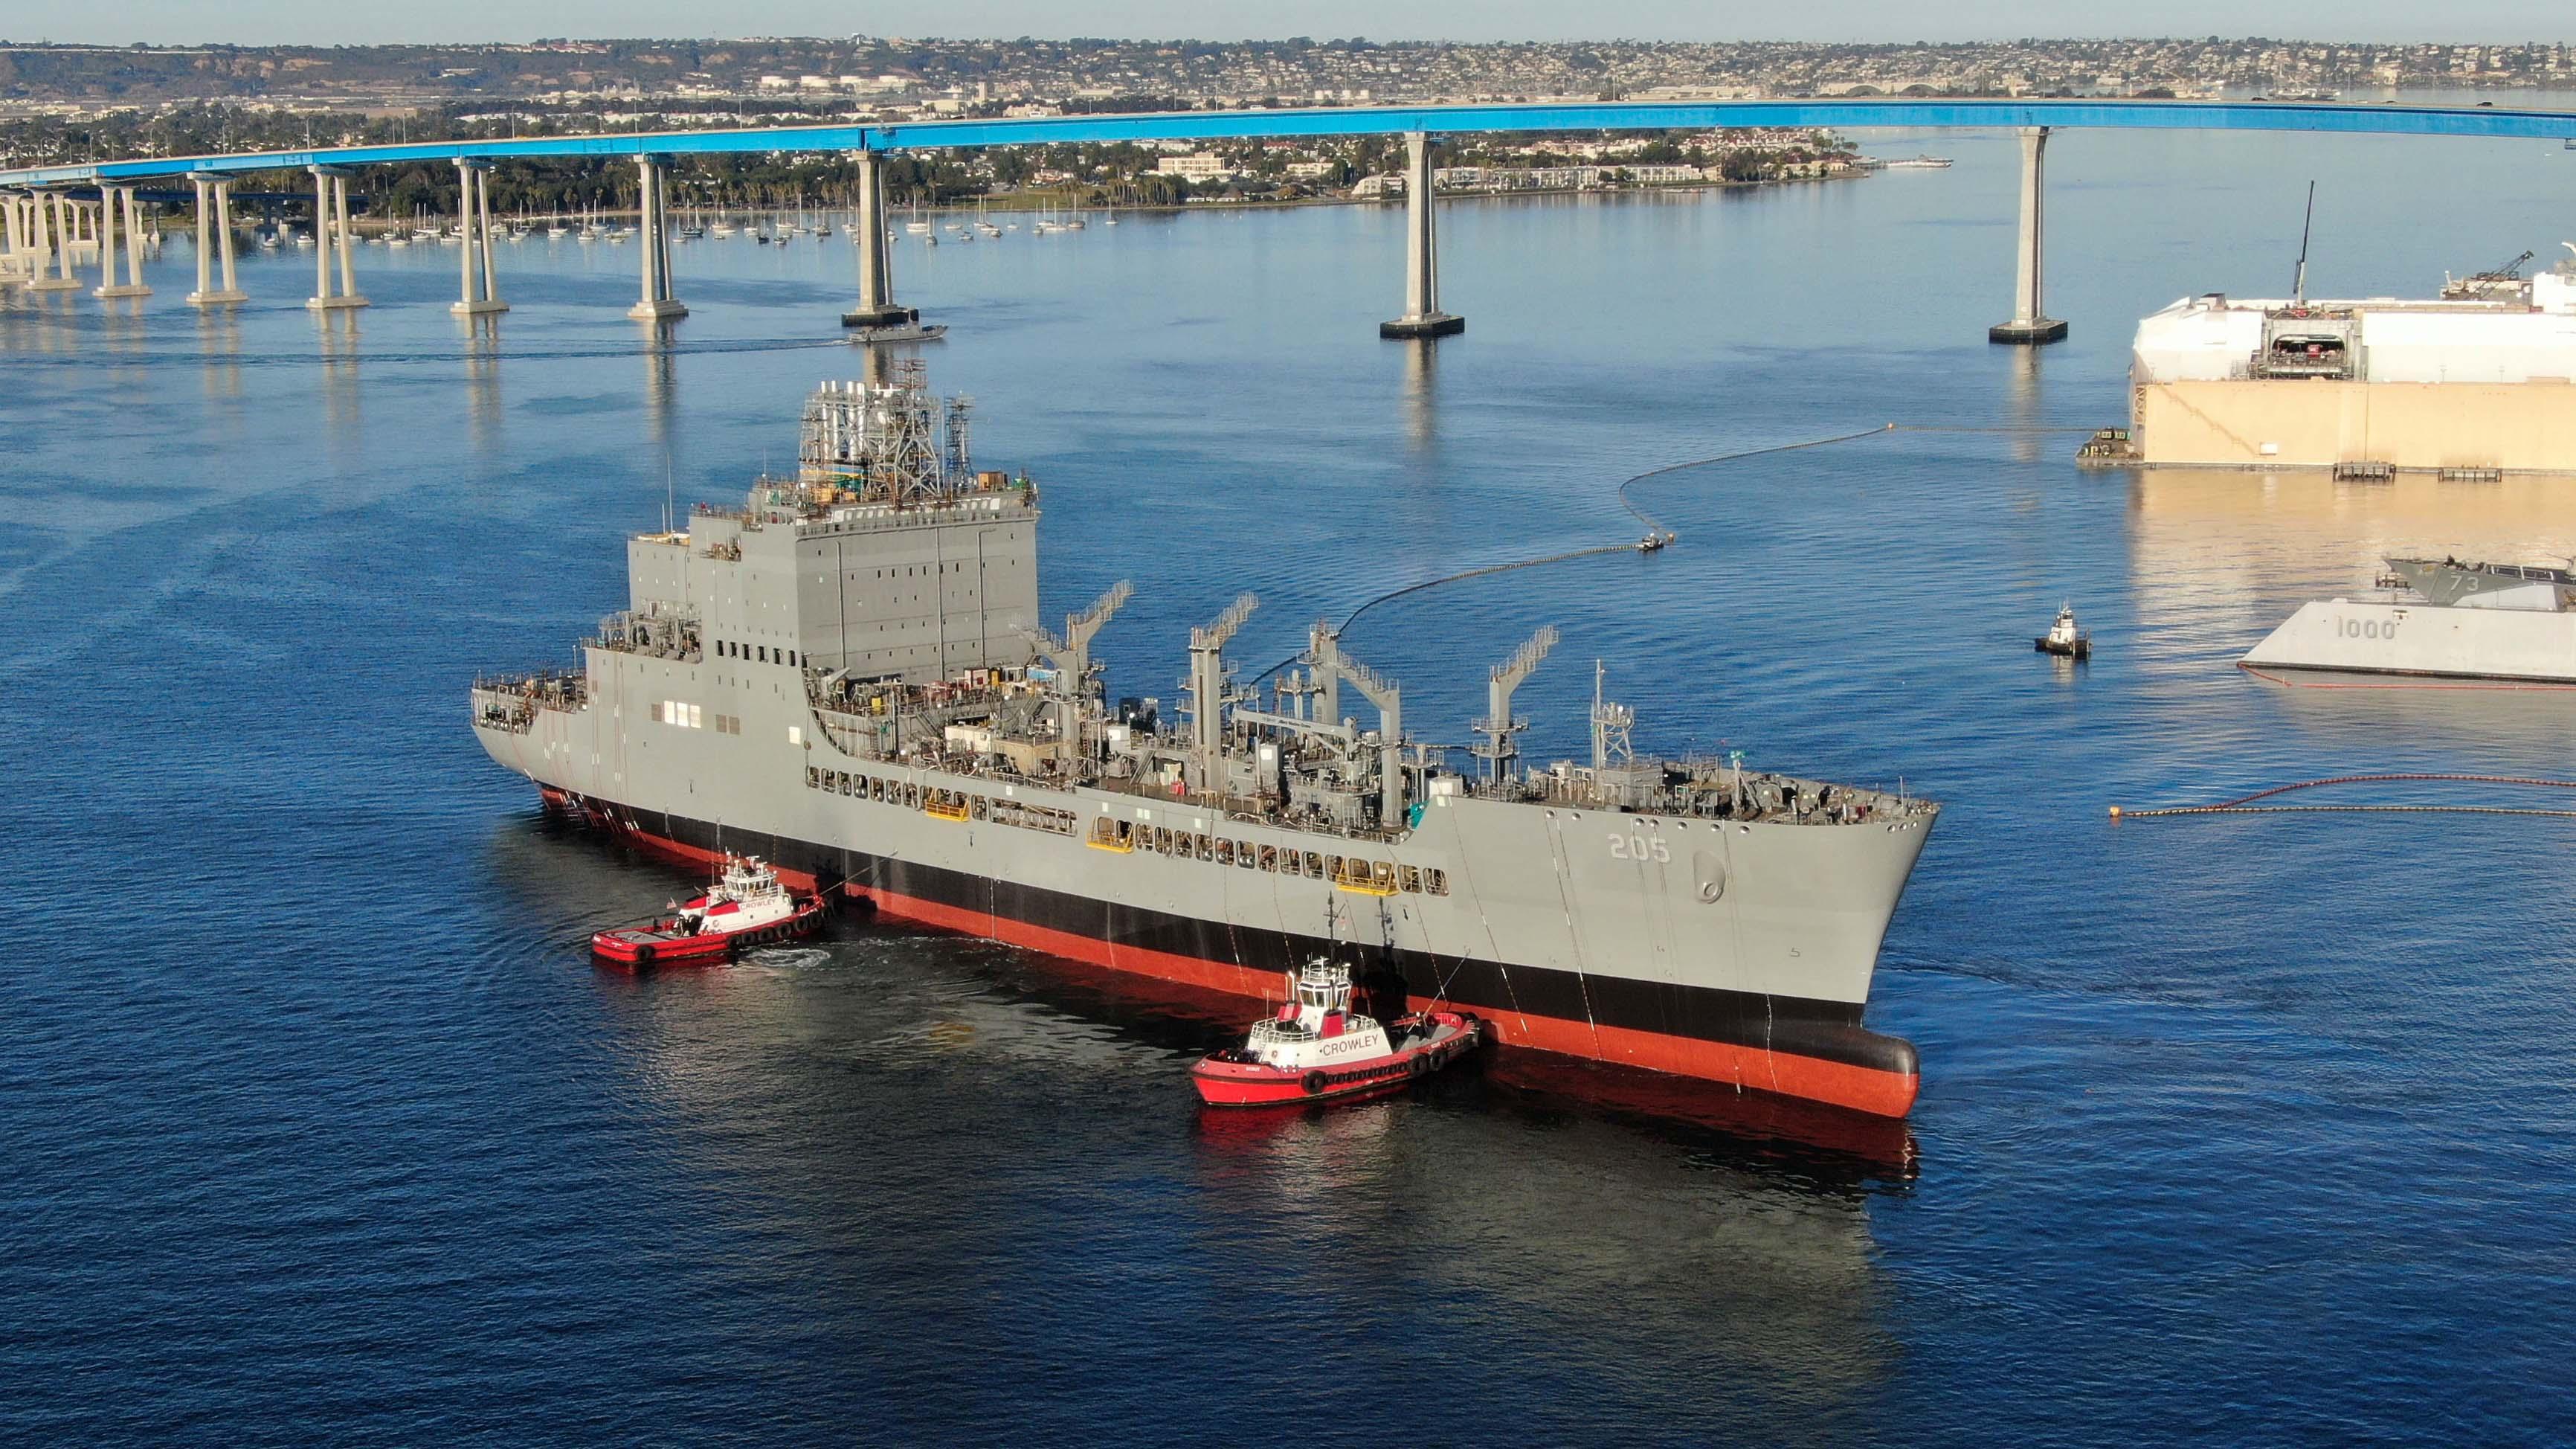 Launch of the future USNS John Lewis (T-AO 205)